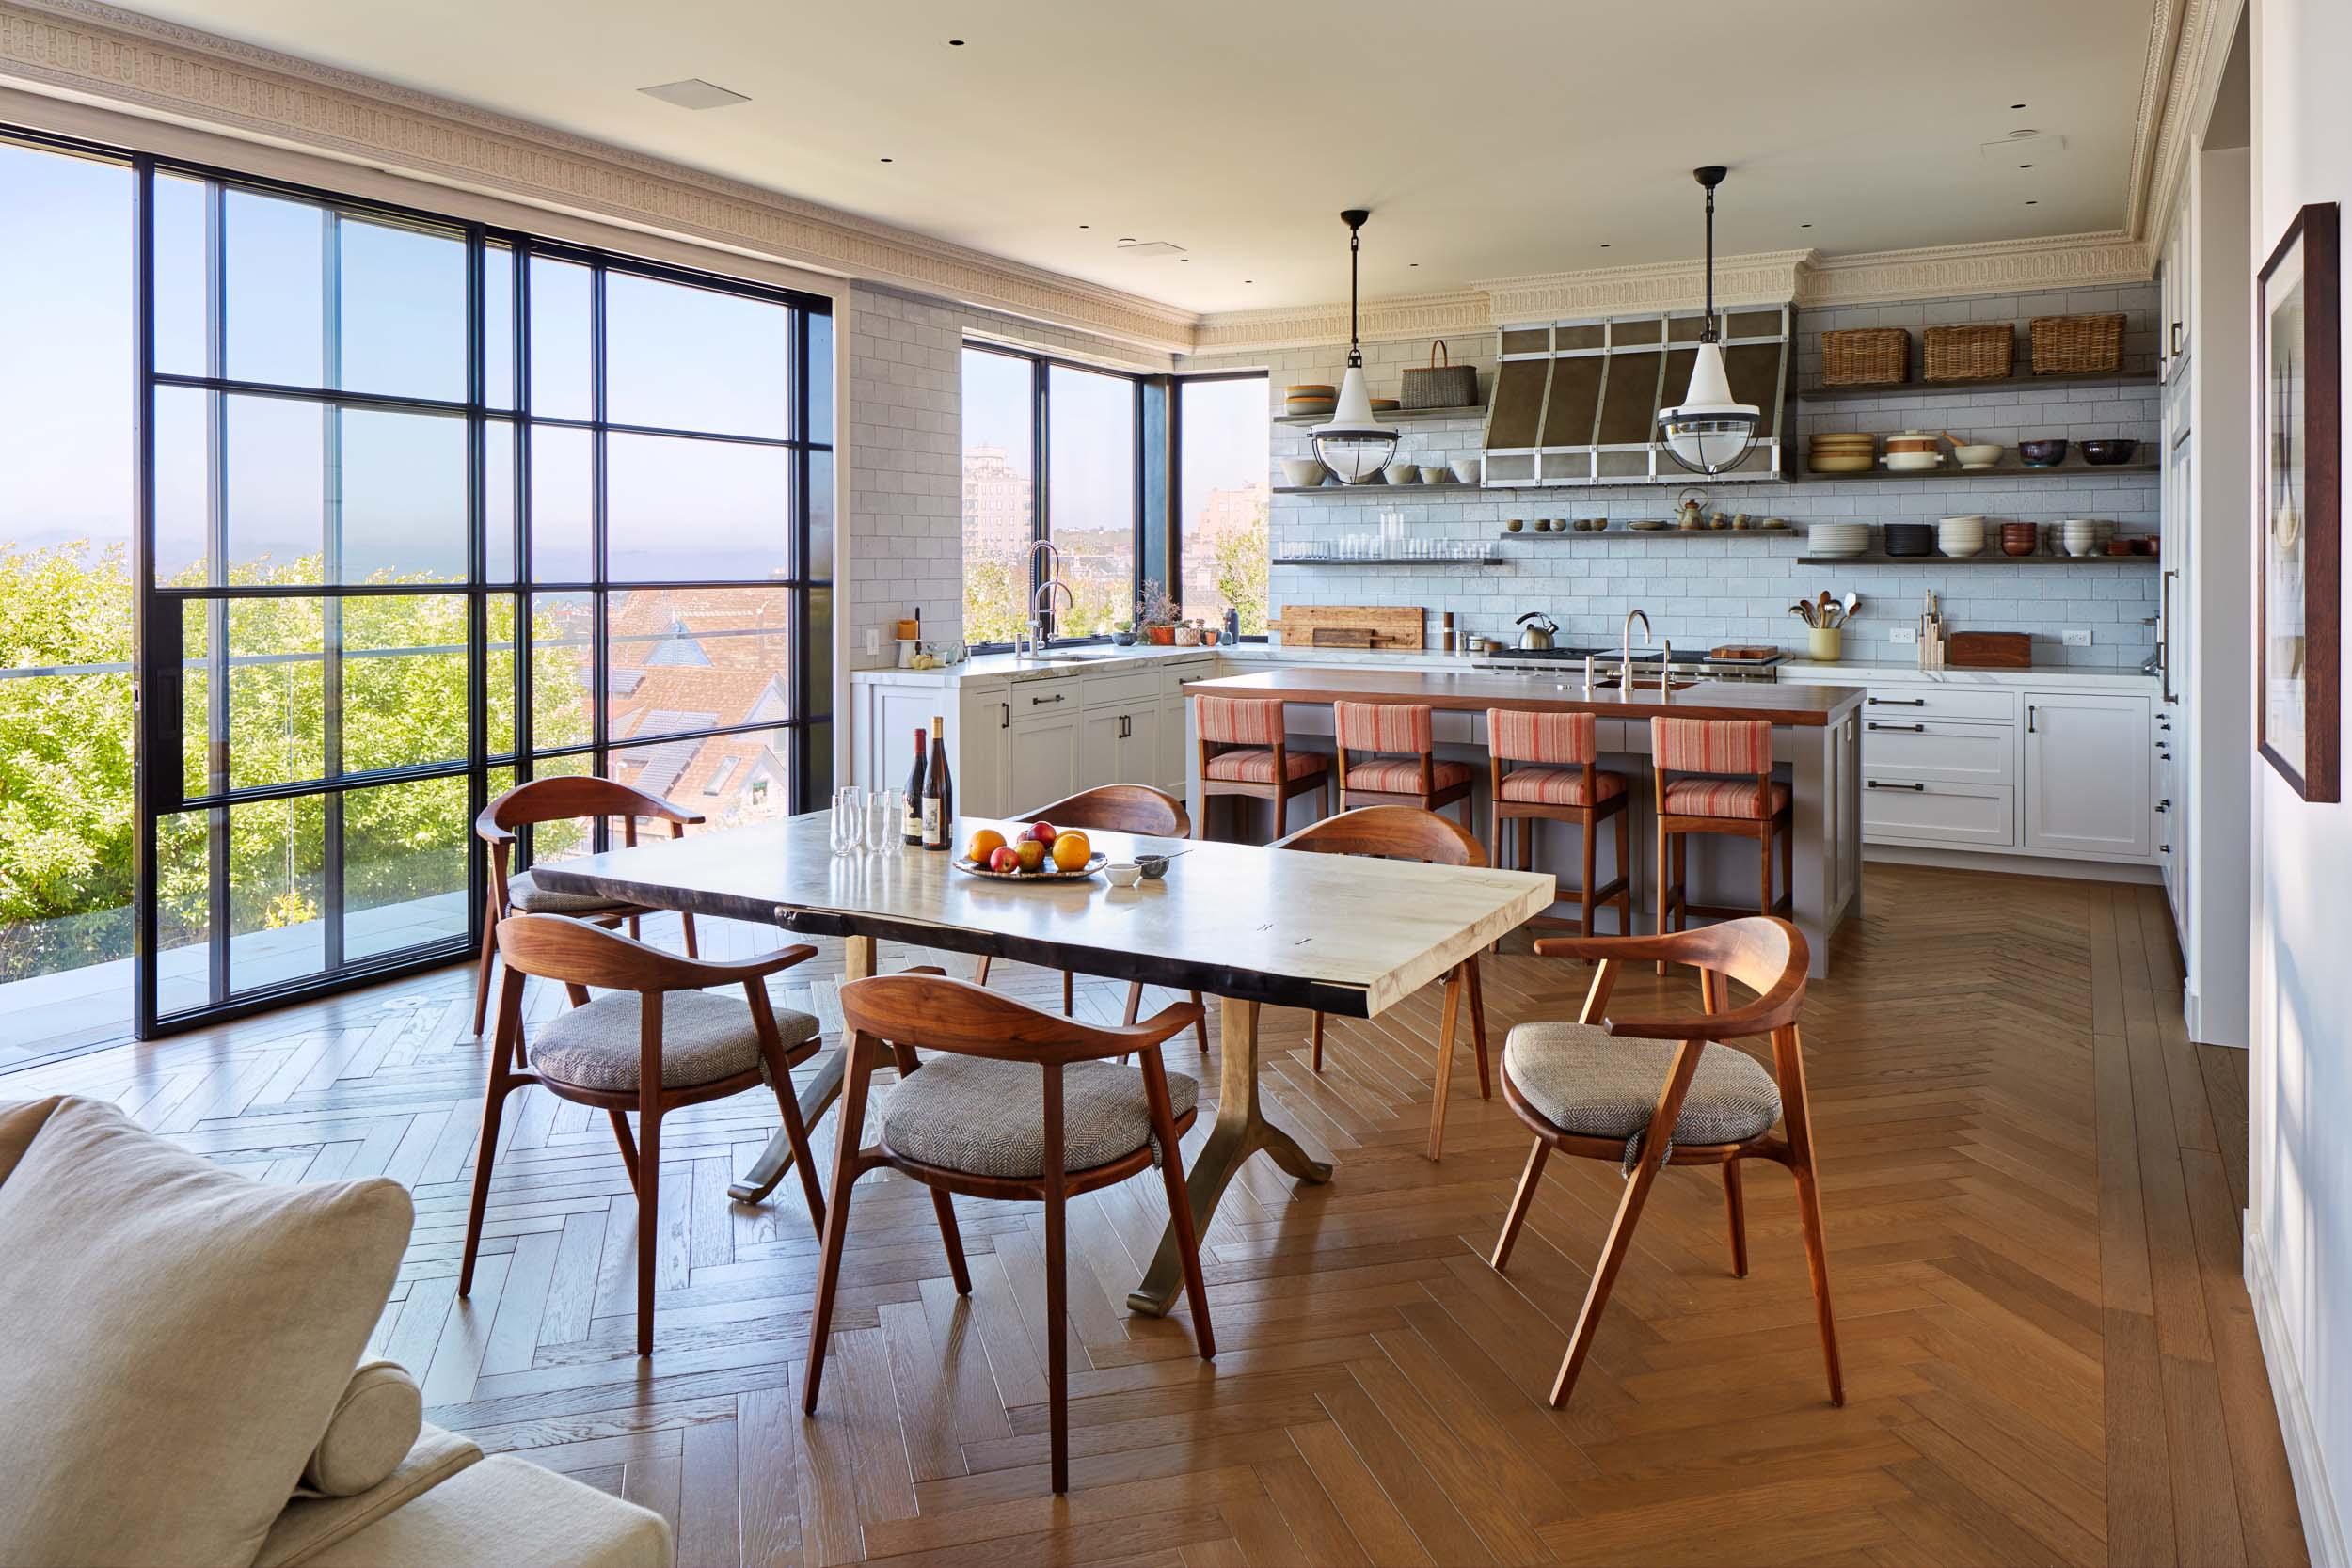 Curate Interiors San Francisco Interior Design-3.jpg